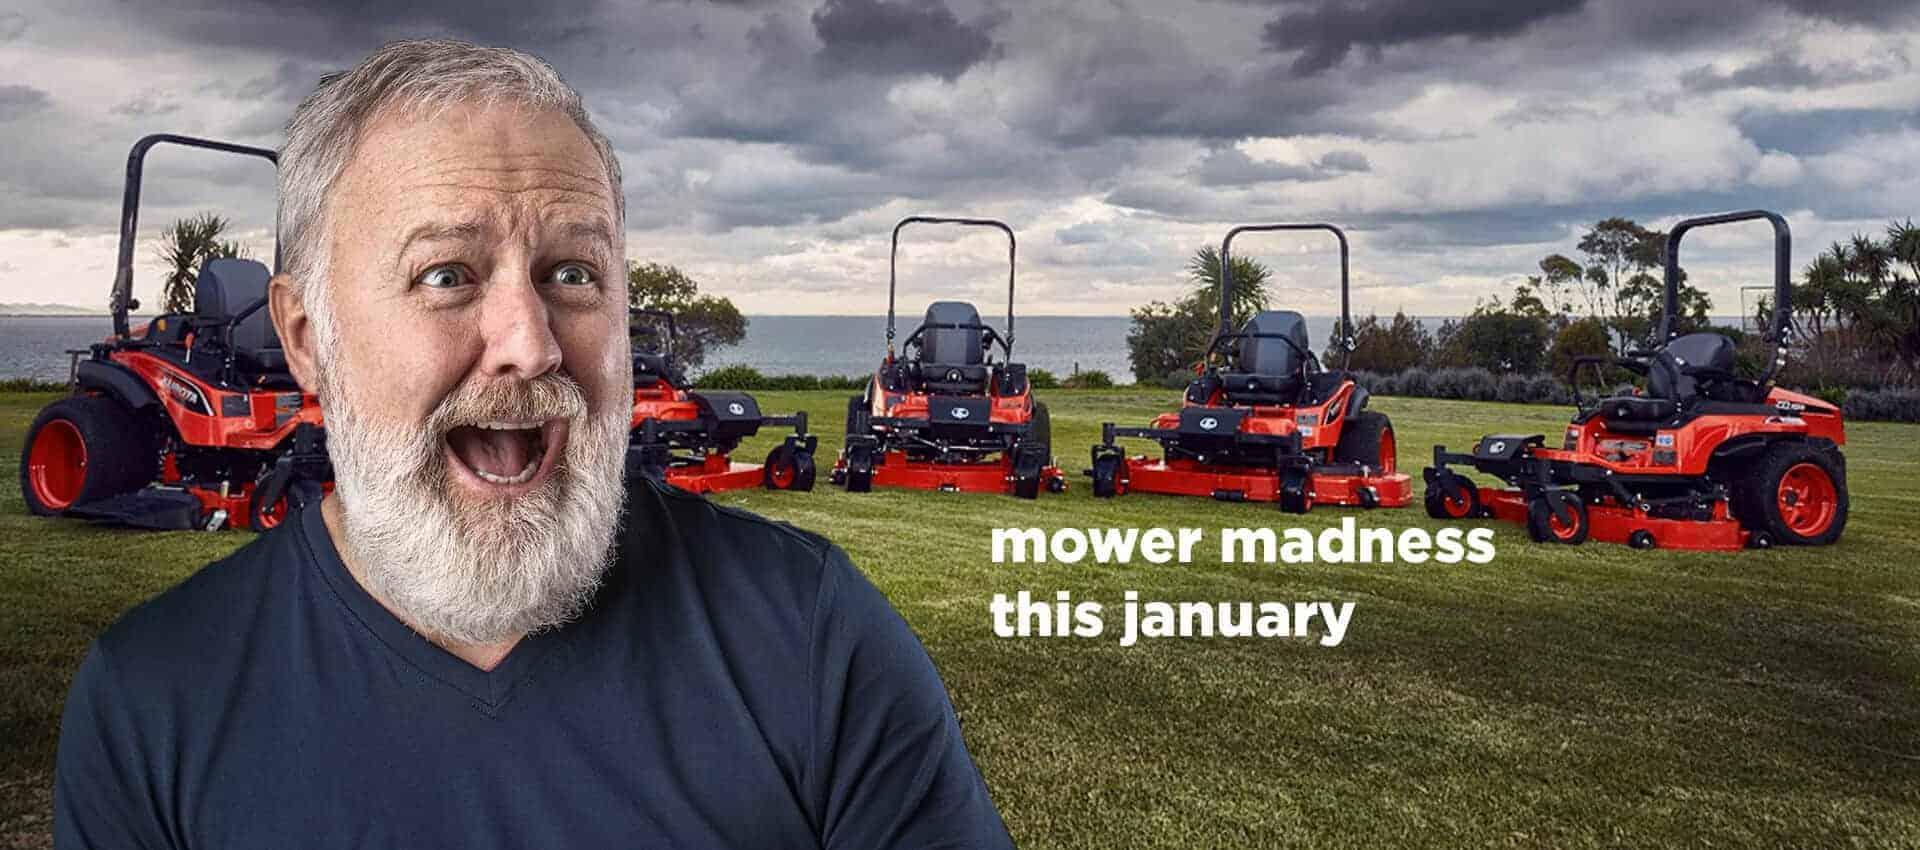 Mower Madness this Jan